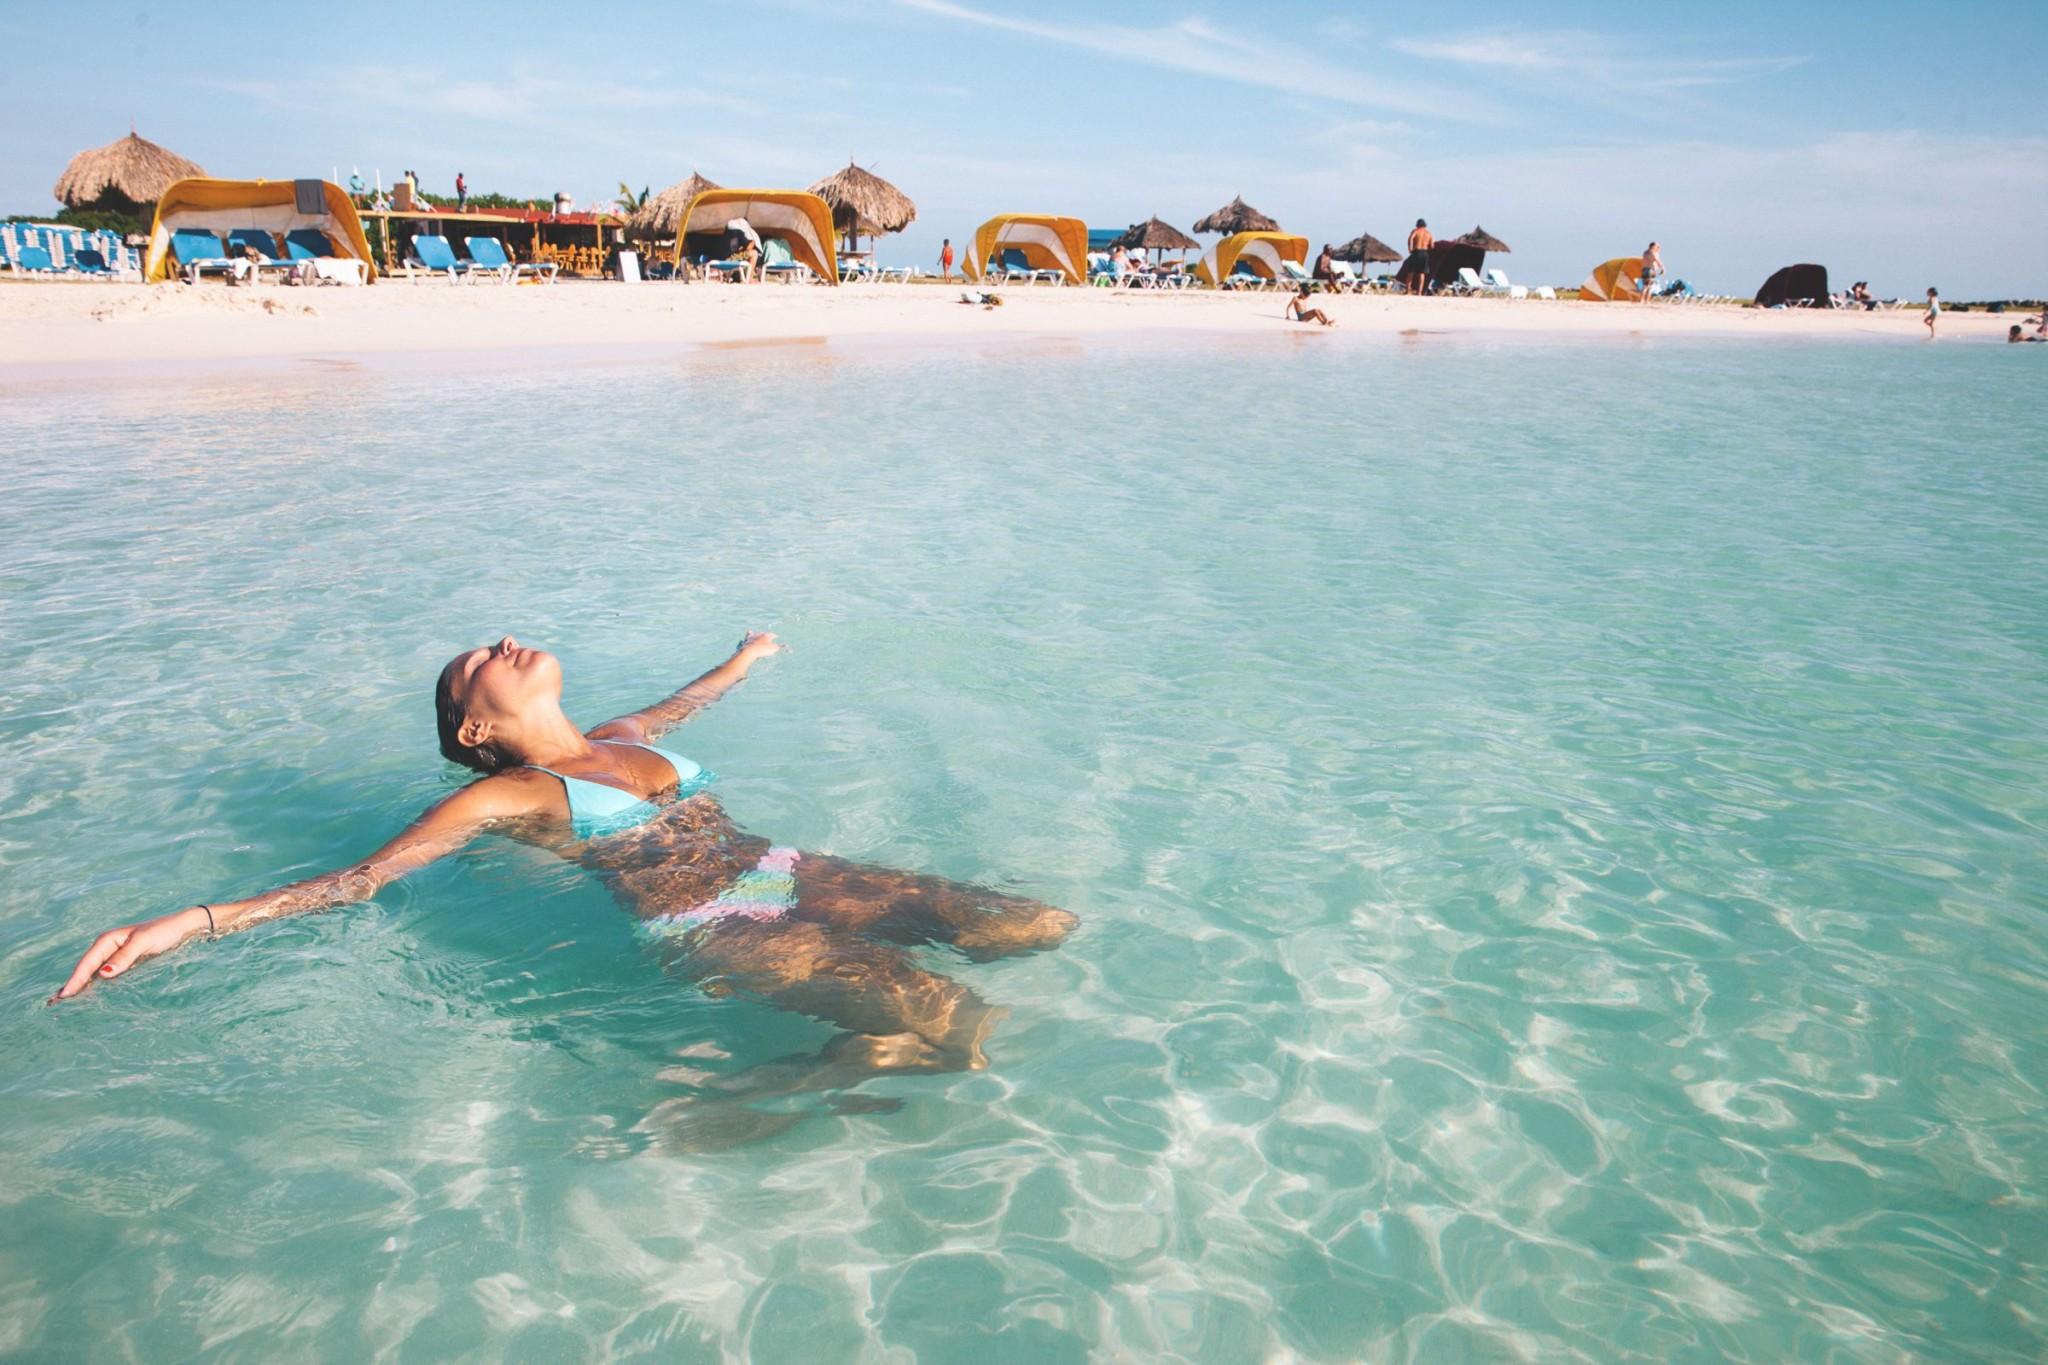 Basking in the Glory of Baby Beach, Aruba: Wish You Were Here